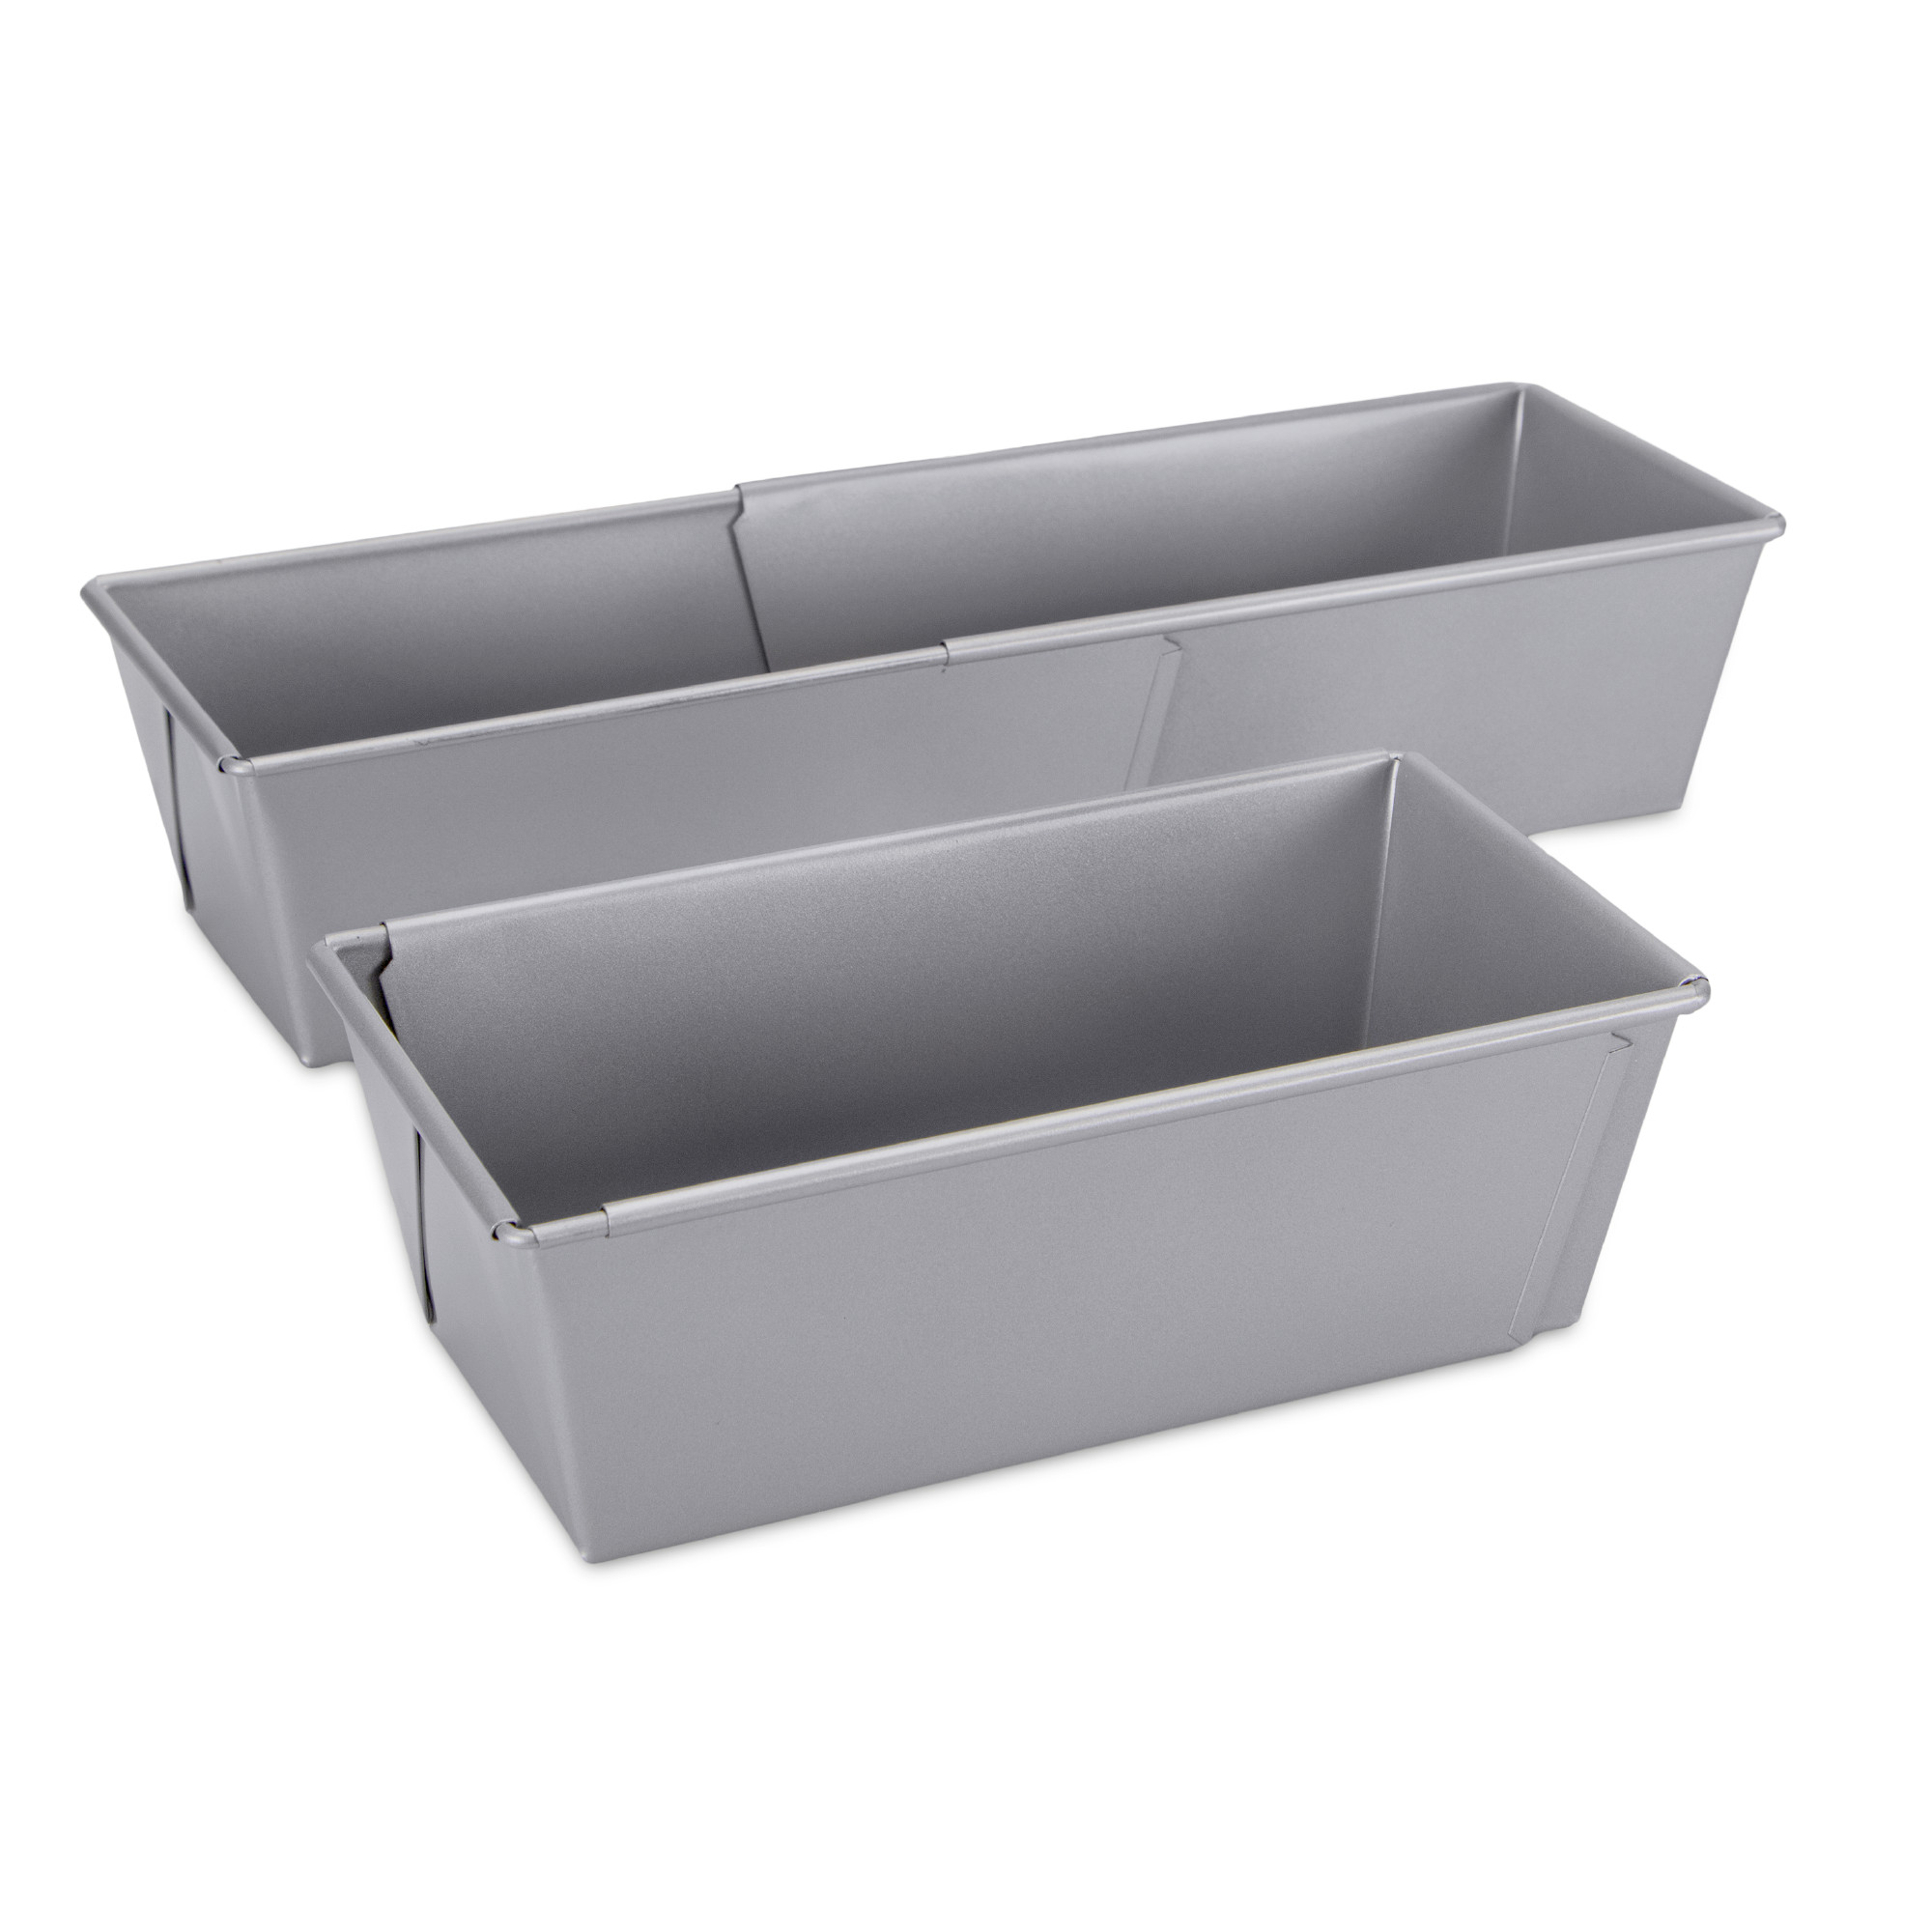 Brotbackform – Kastenform – ausziehbar we love baking 661592